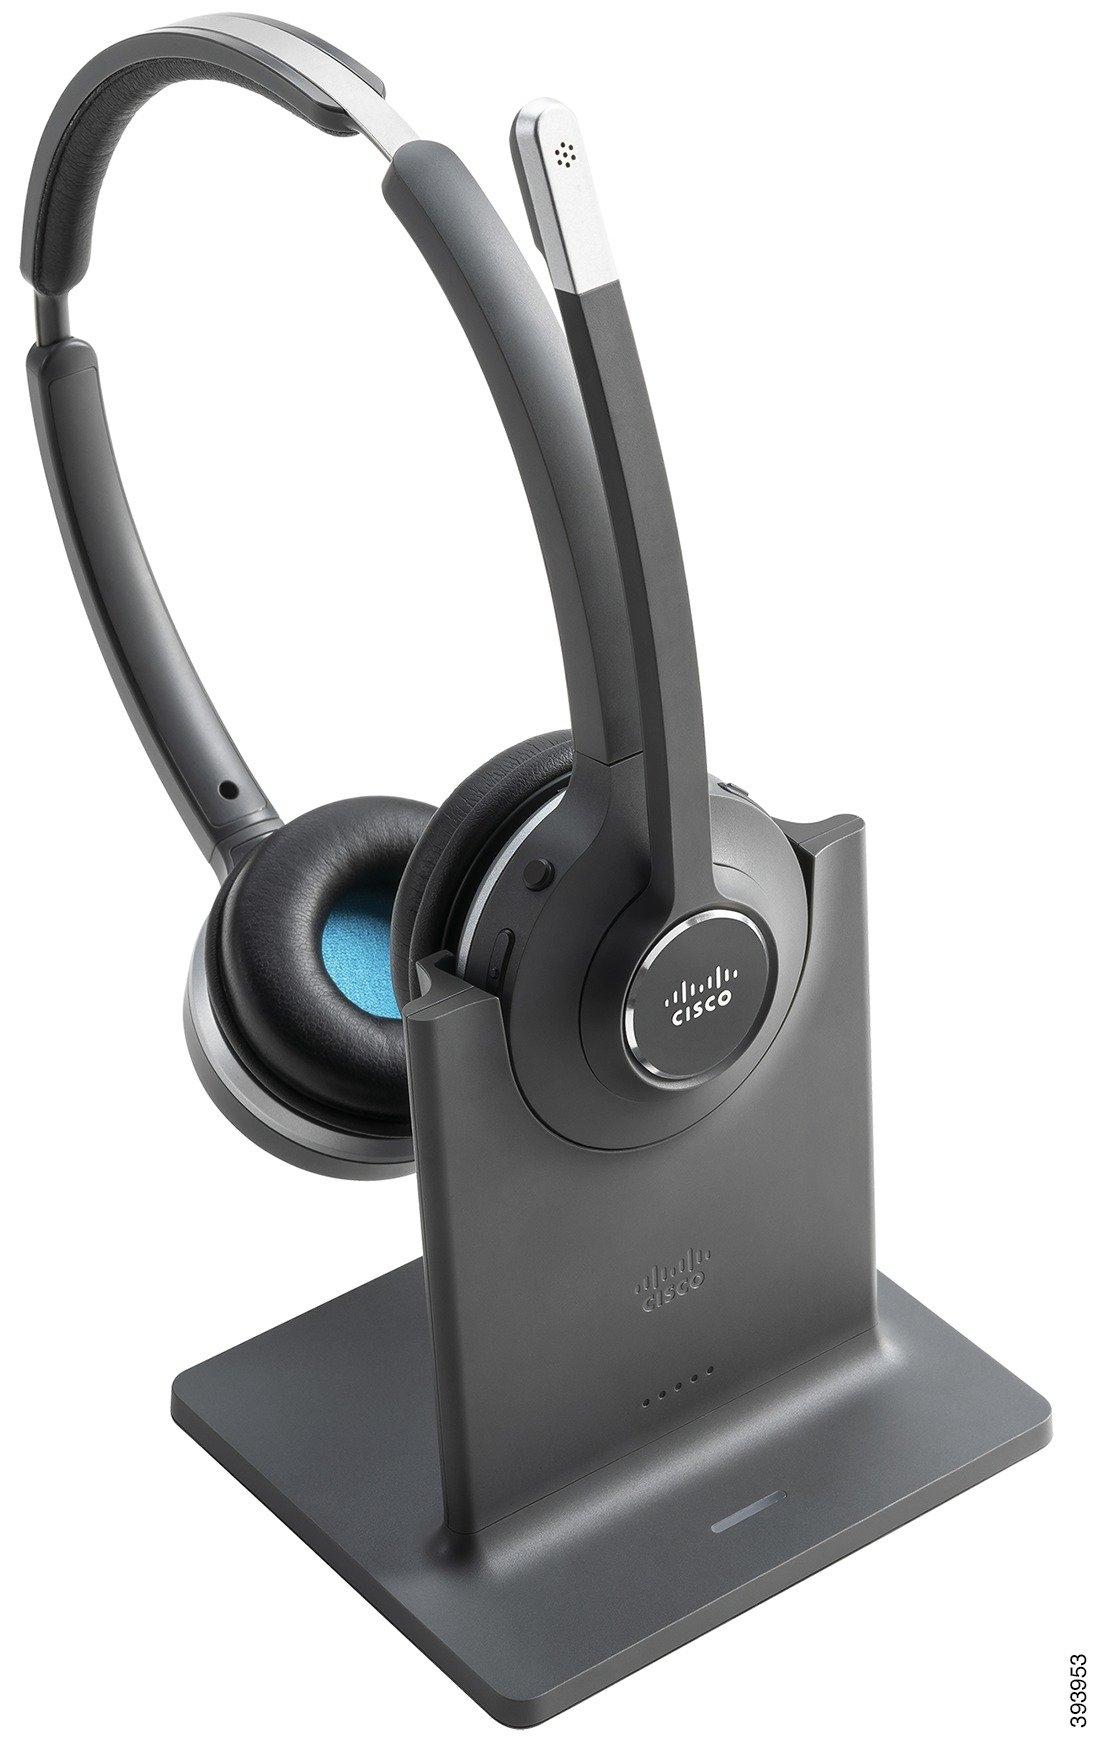 Cisco 562 Wireless Binaural Headset With Standard Base Cp Hs Wl 562 S Us Voip Supply